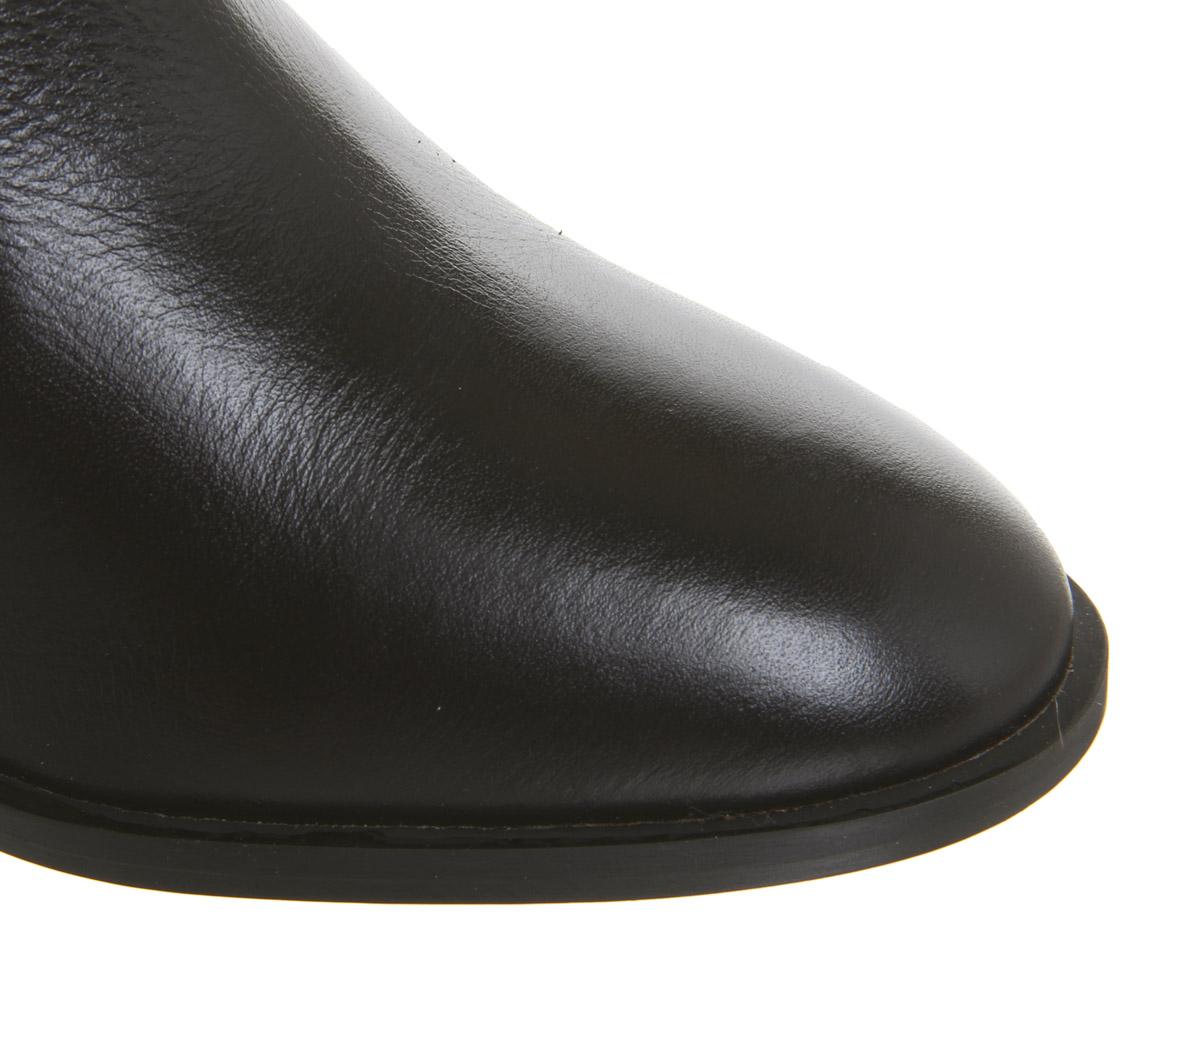 Damenschuhe Leder Office Alford Unlined Block Heel Stiefel Choc Leder Damenschuhe Stiefel 694304